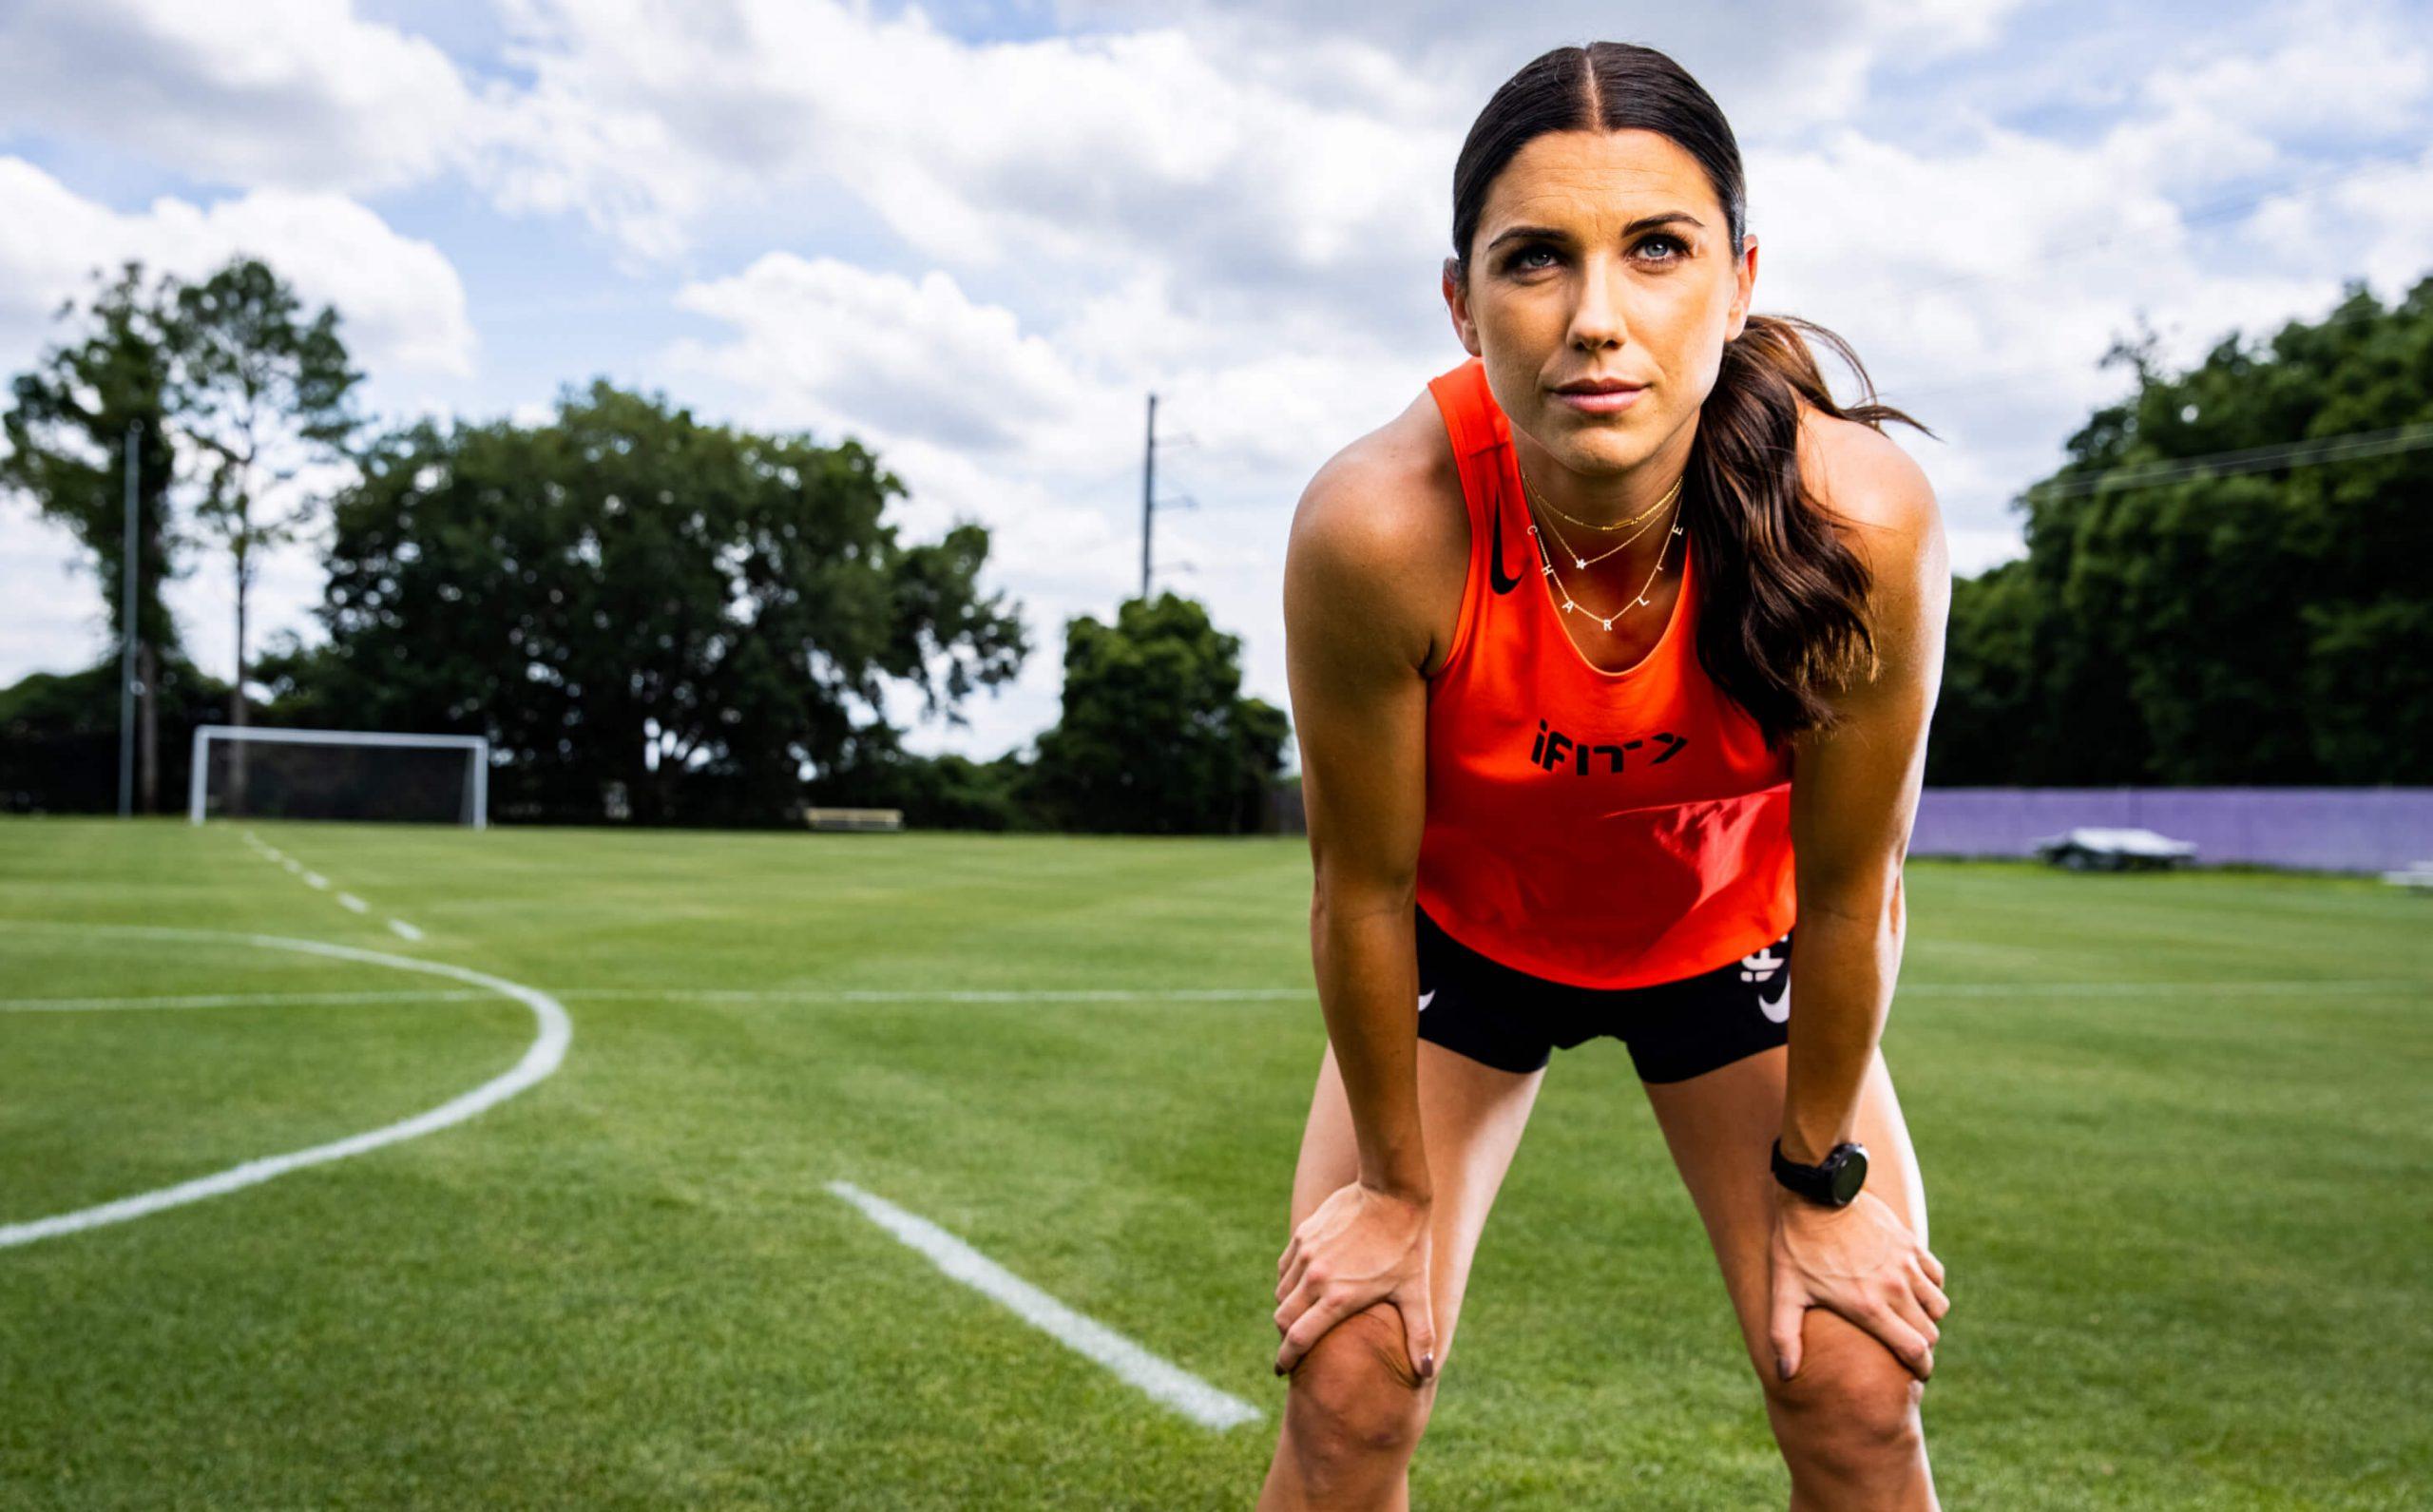 iFIT Trainer Alex Morgan coaches a cardio workout